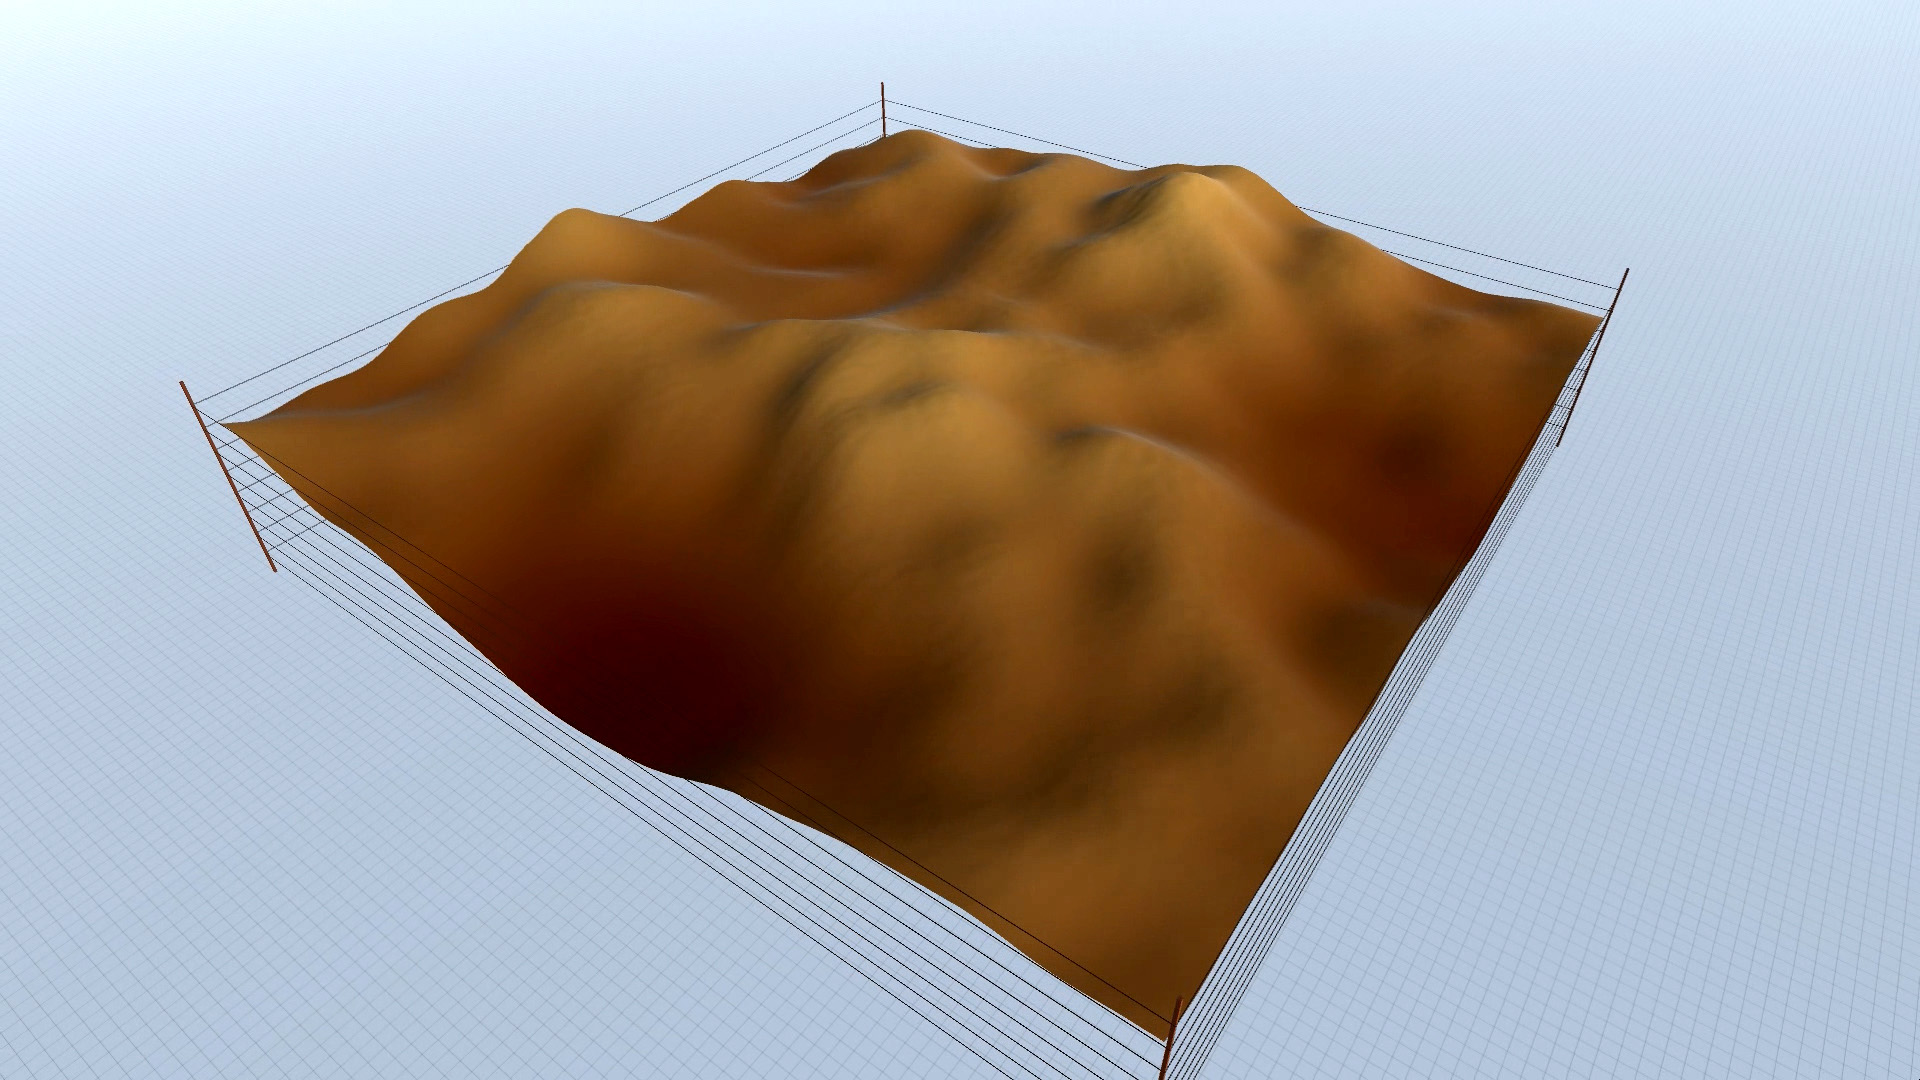 konsfik-procedural-landscape-animated-play-mode-screenshot-6